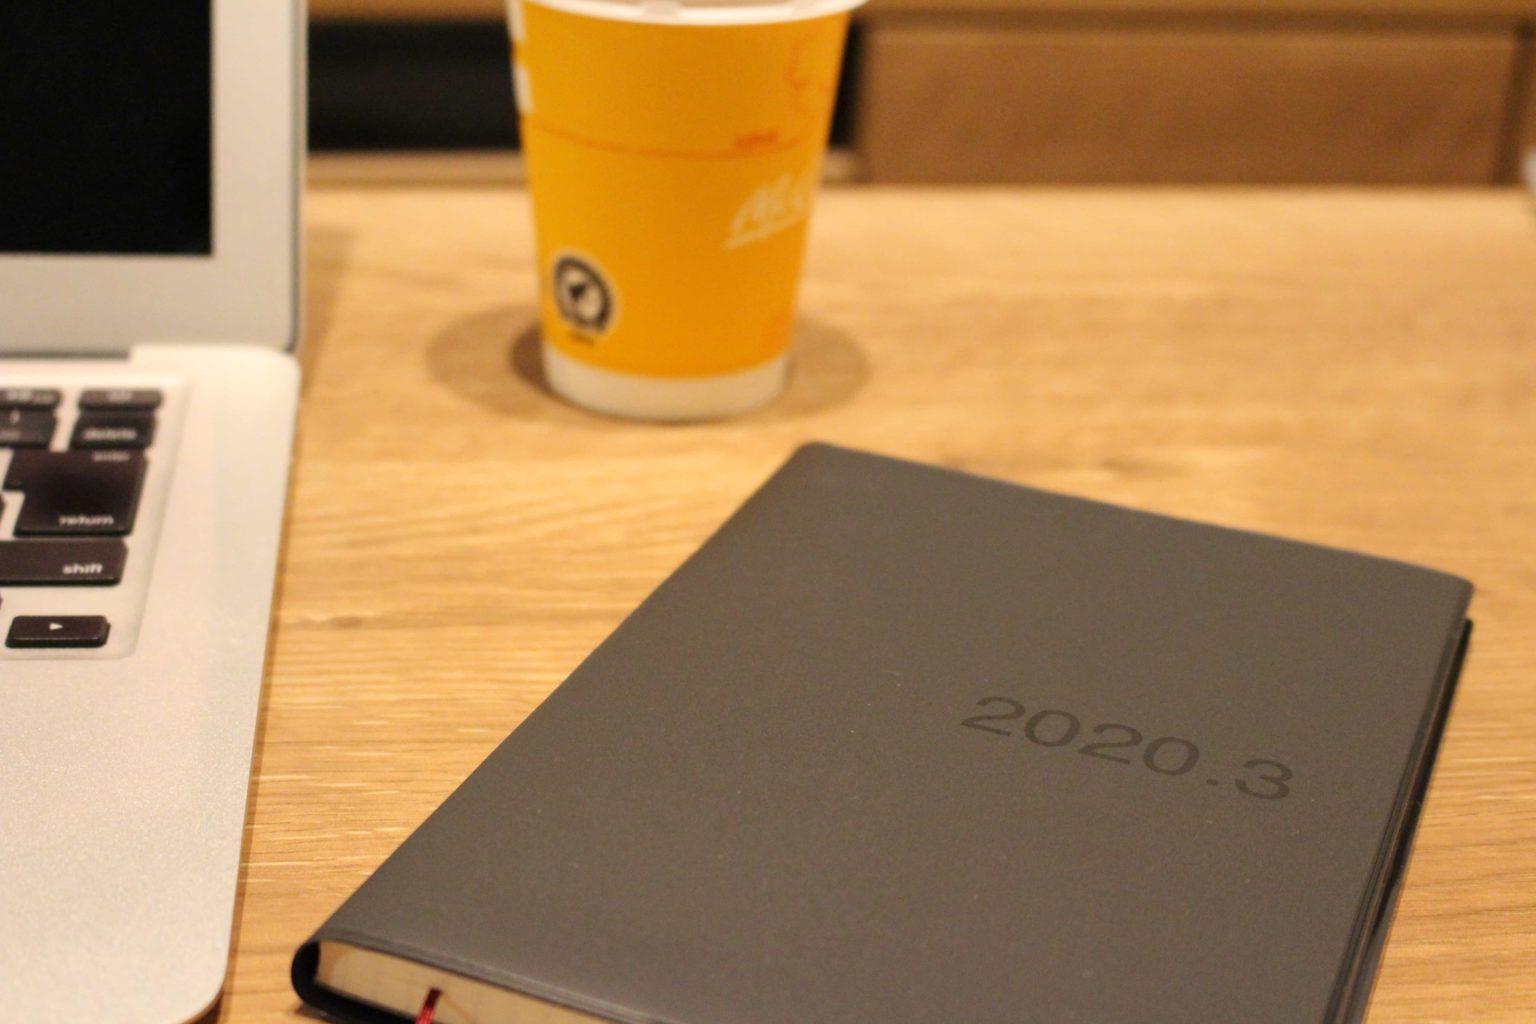 notebook muji 無印 無印良品 手帳 mac cafe B6 ウィークリー マンスリー